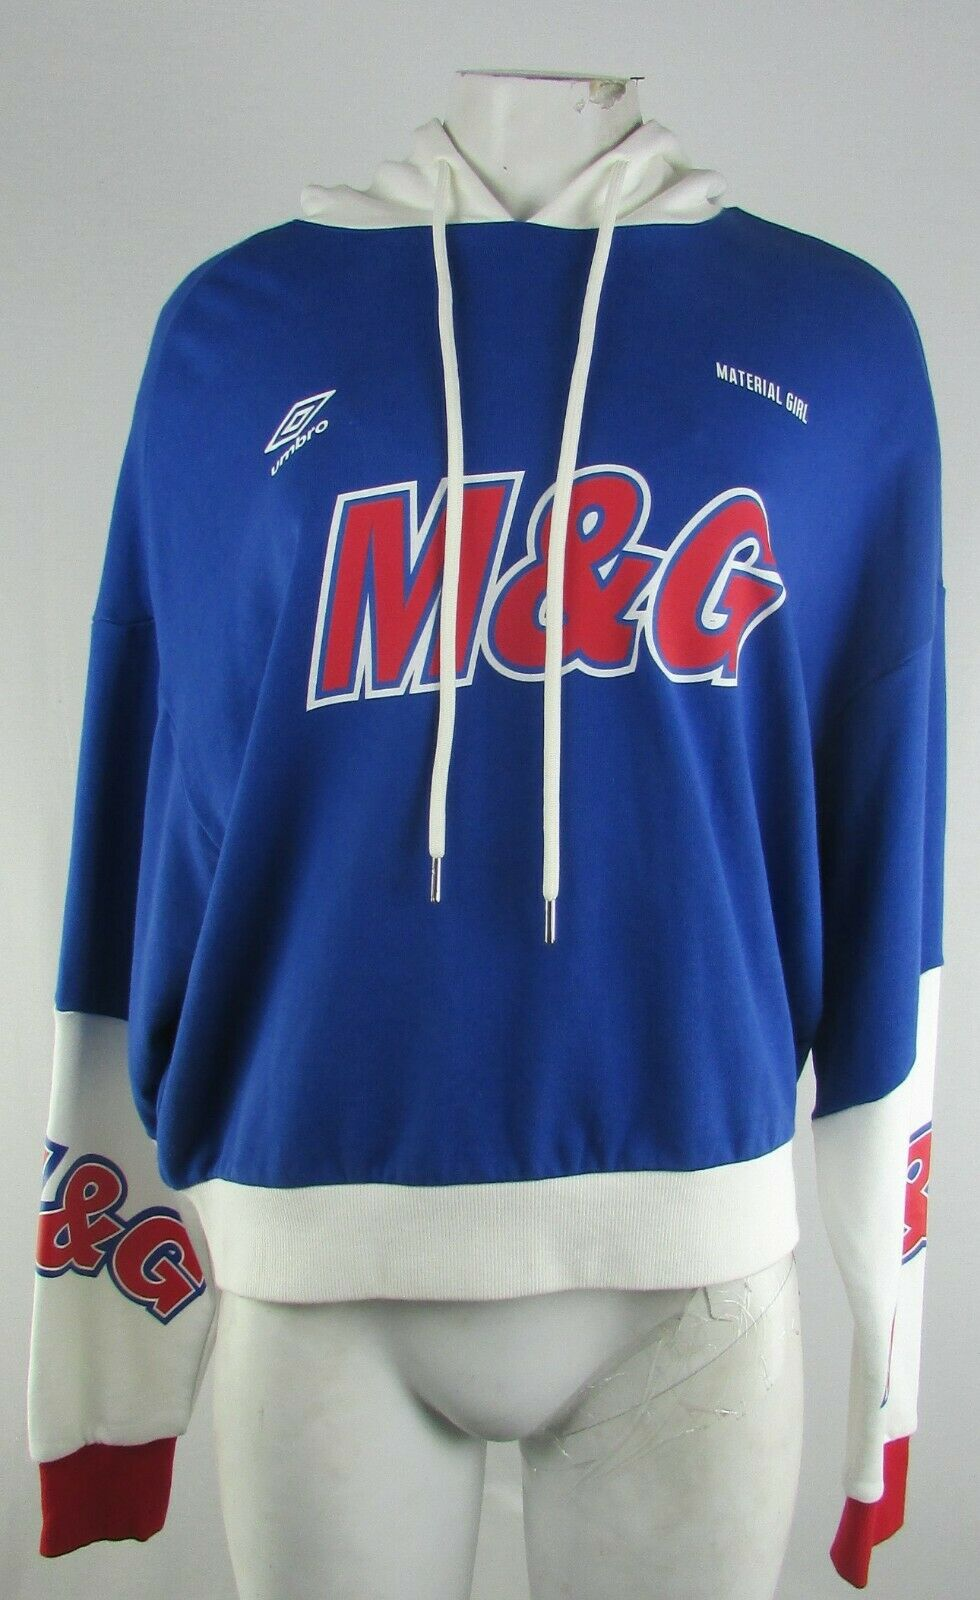 Umbro Material Girl Women's Blue Hooded Sweatshirt